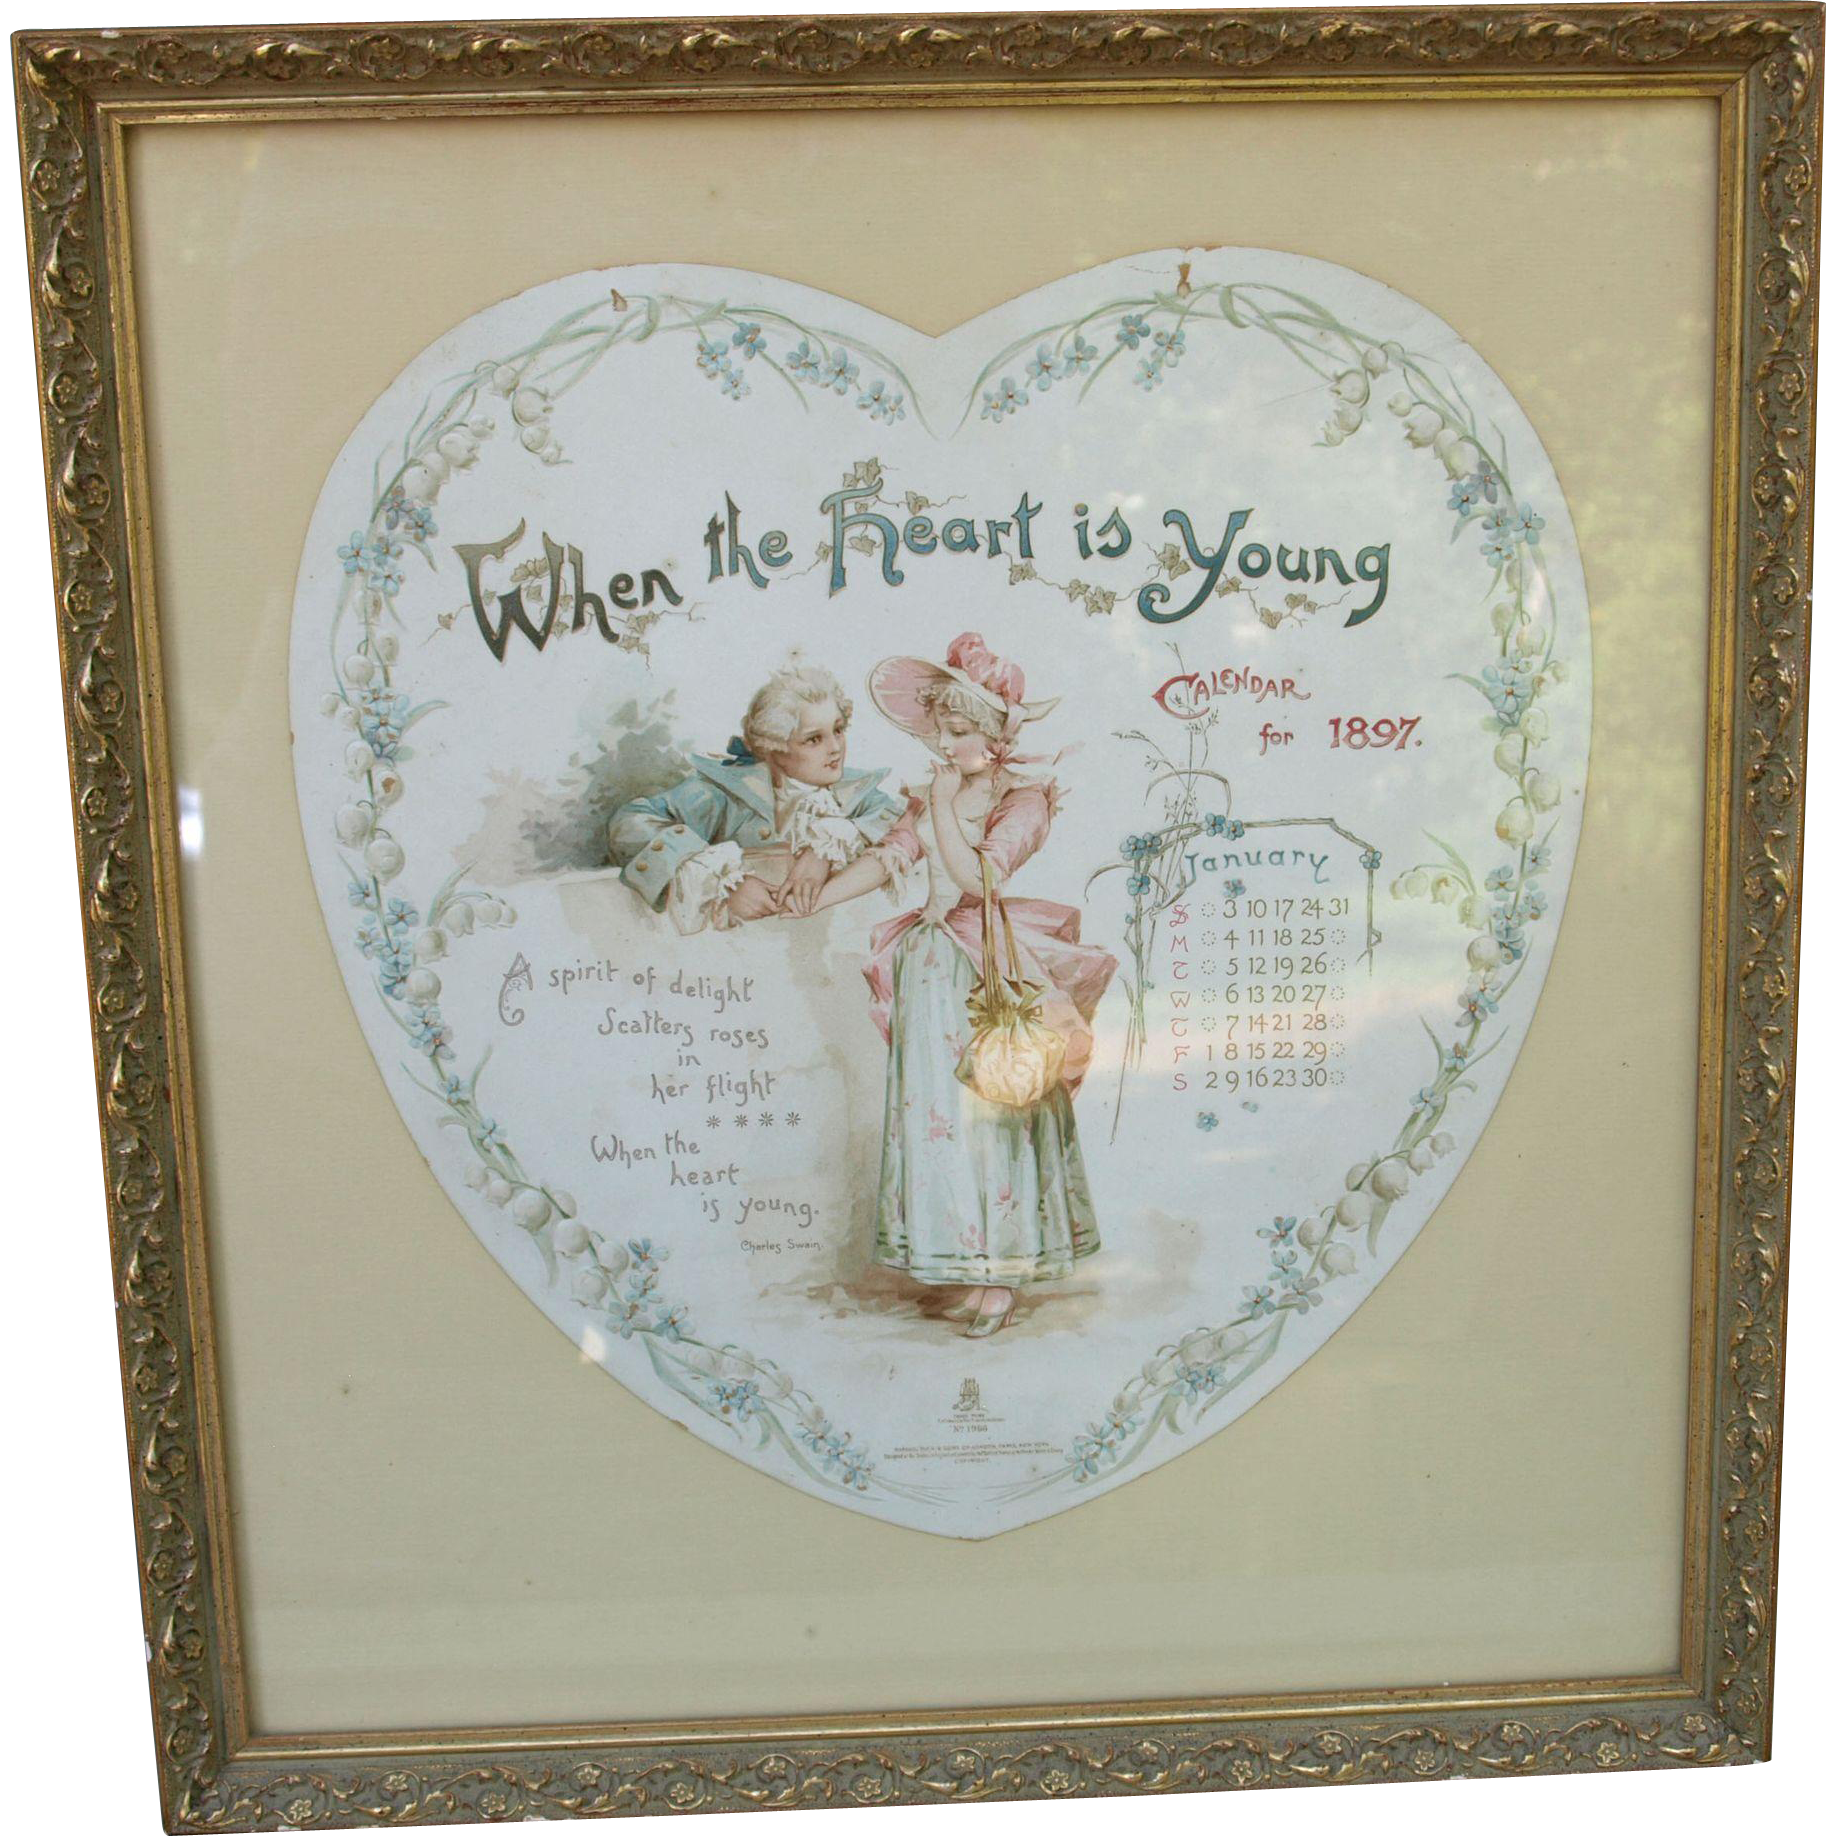 Framed 1897 Frances Brundage original Valentine Calendar When The Heart Is Young  Raphael Tuck print page January 1897 framed under glass